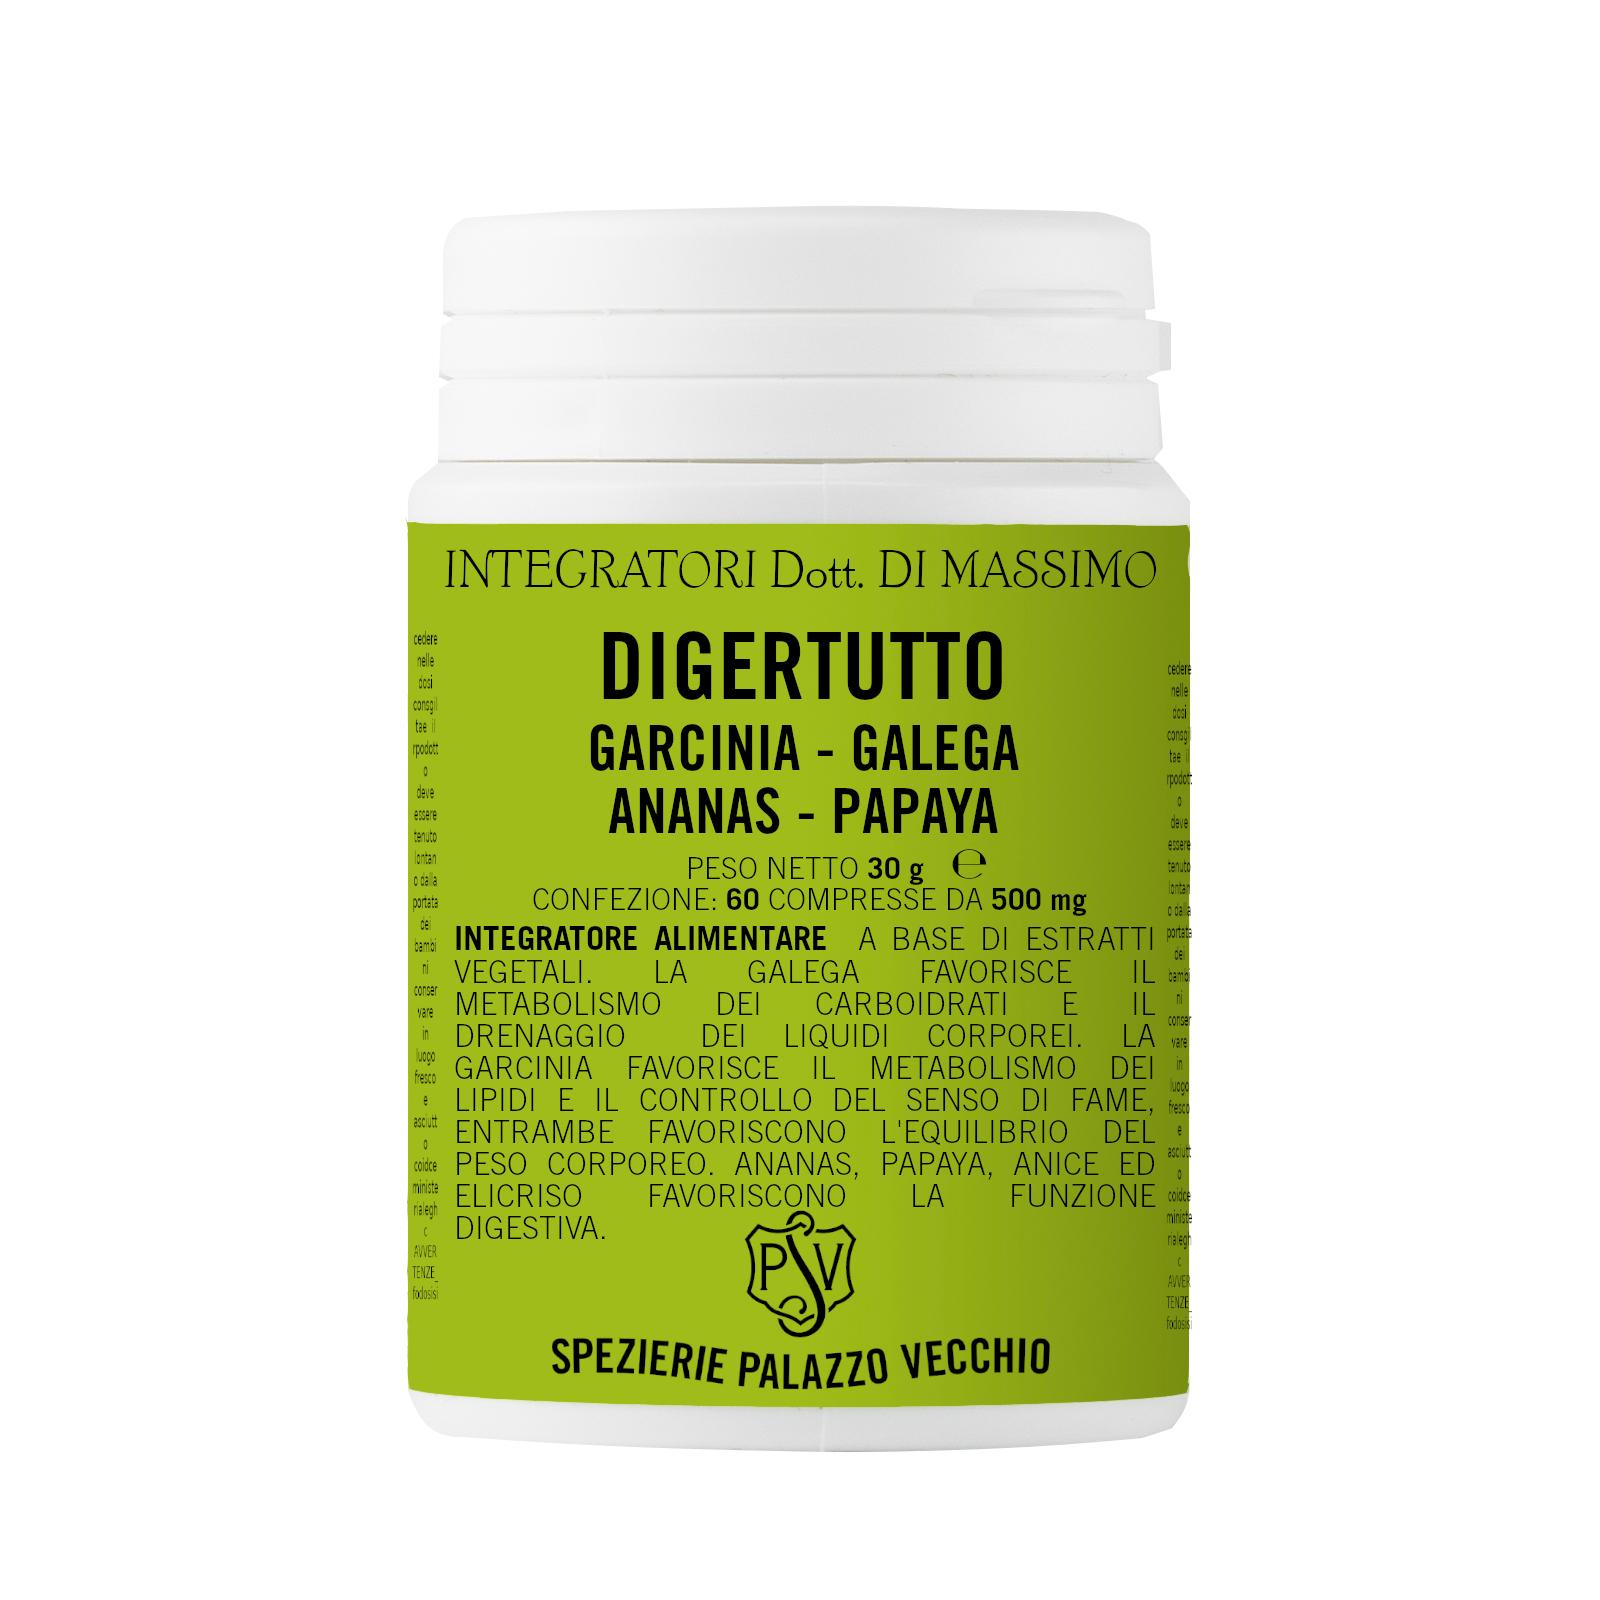 DIGERTUTTO Garcinia - Galega- Ananas - Papaya-0